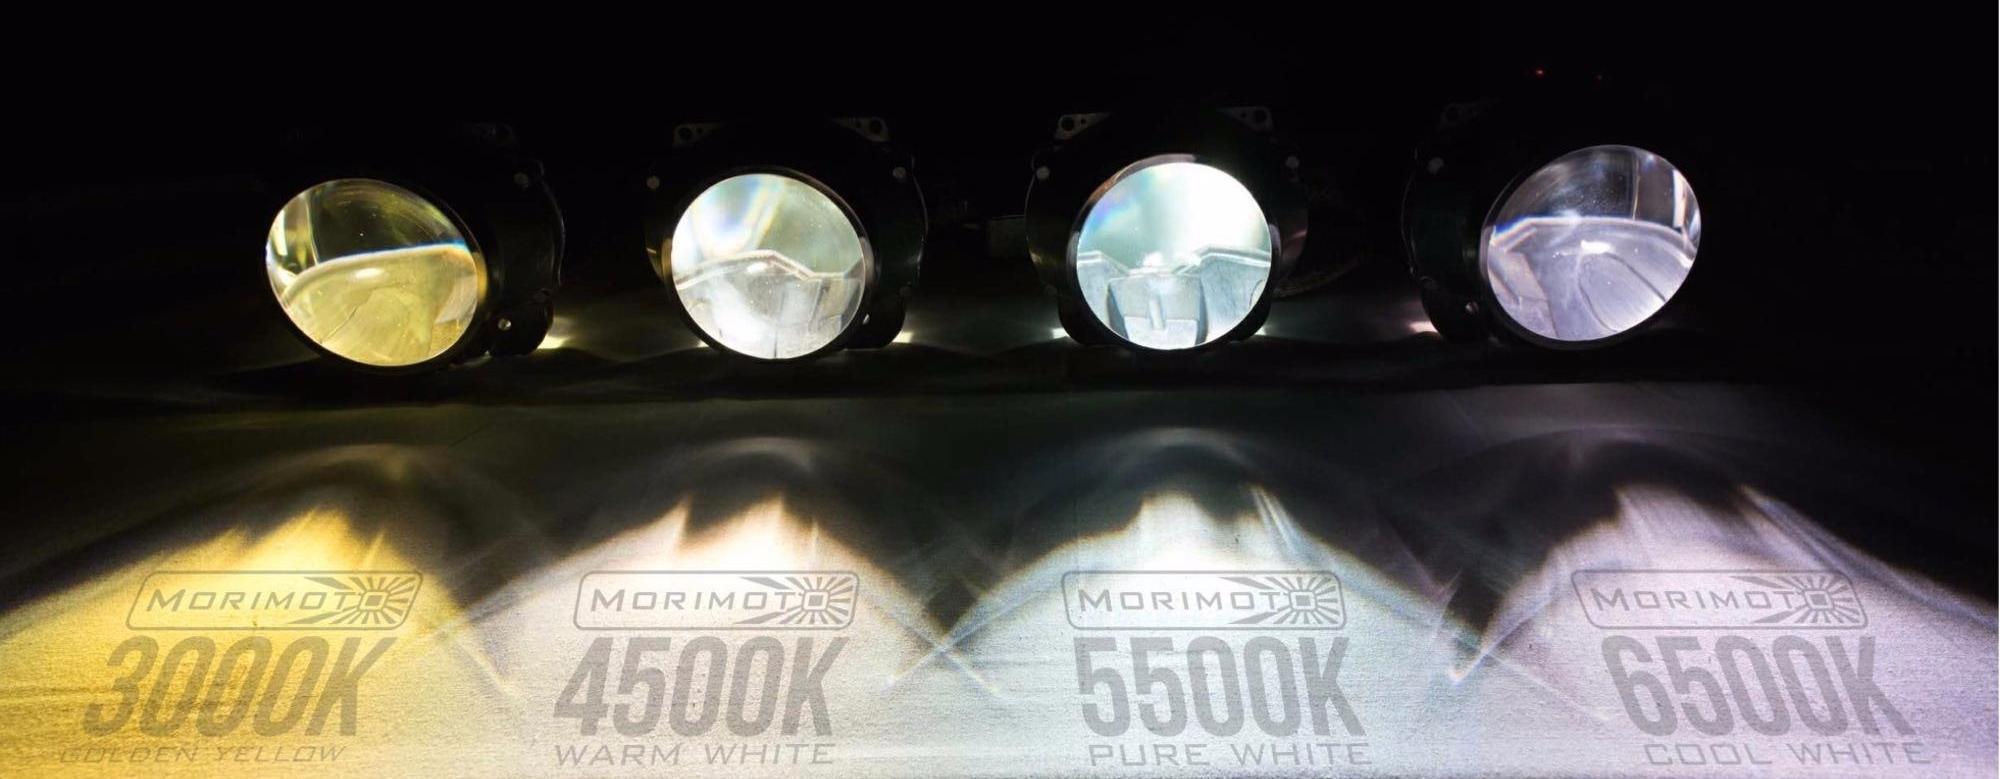 morimoto_xb_hid_headlight_bulbs_kelvin_comparison_1_1.jpg